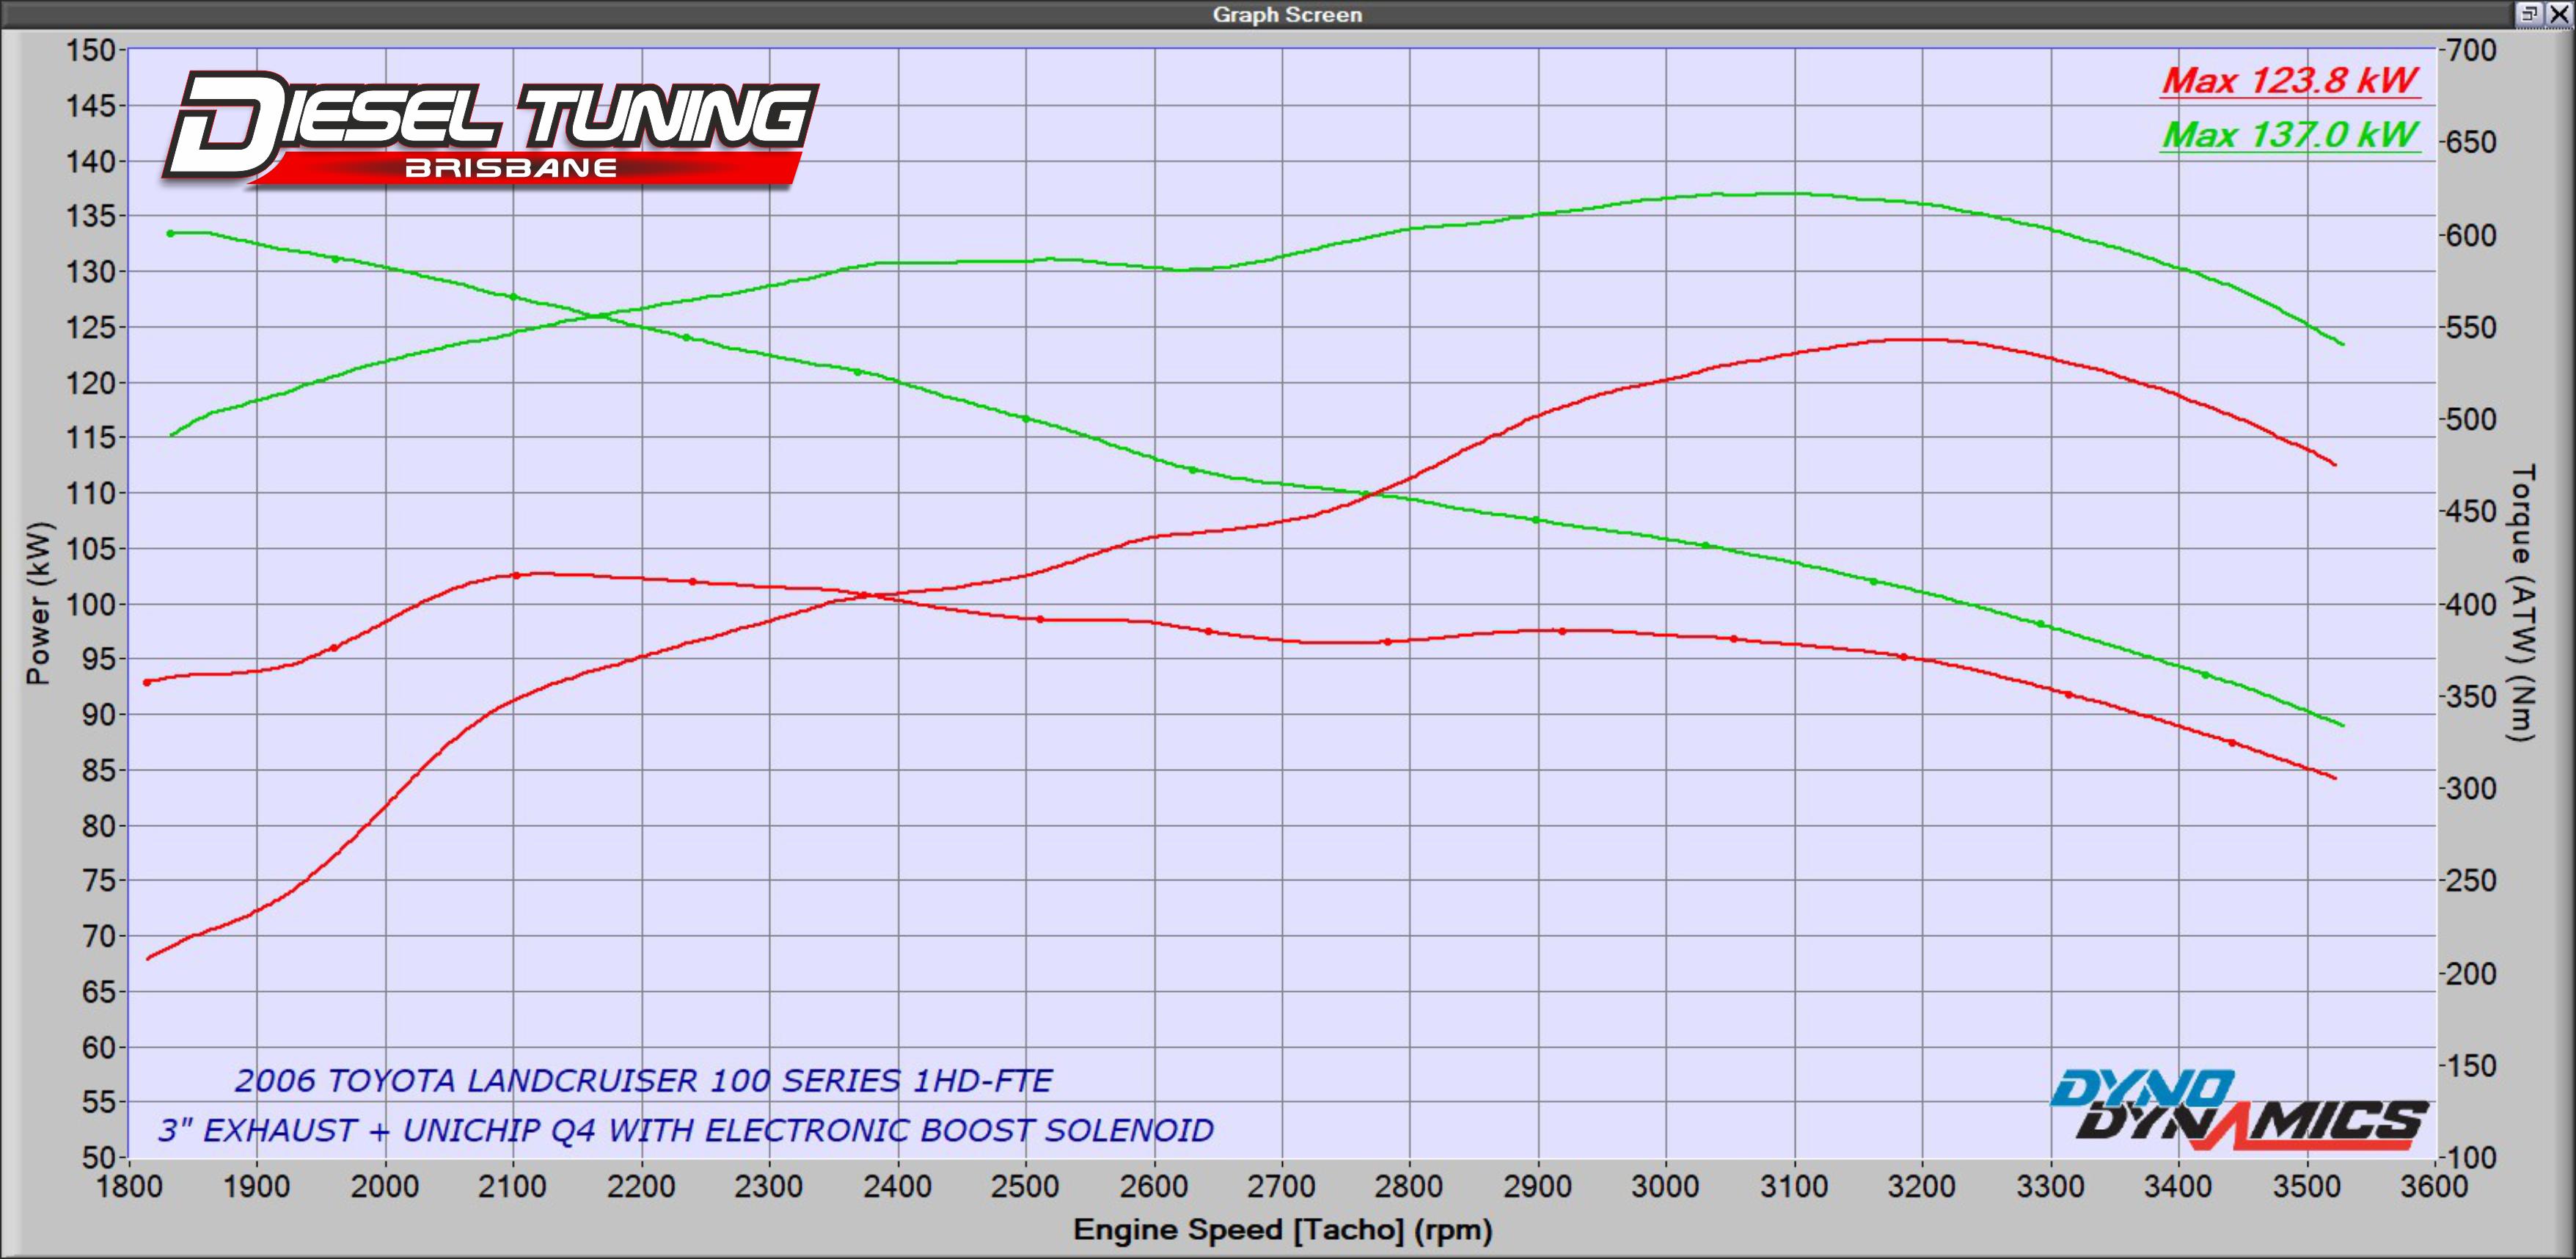 105 Series UniChip + Exhaust Graph